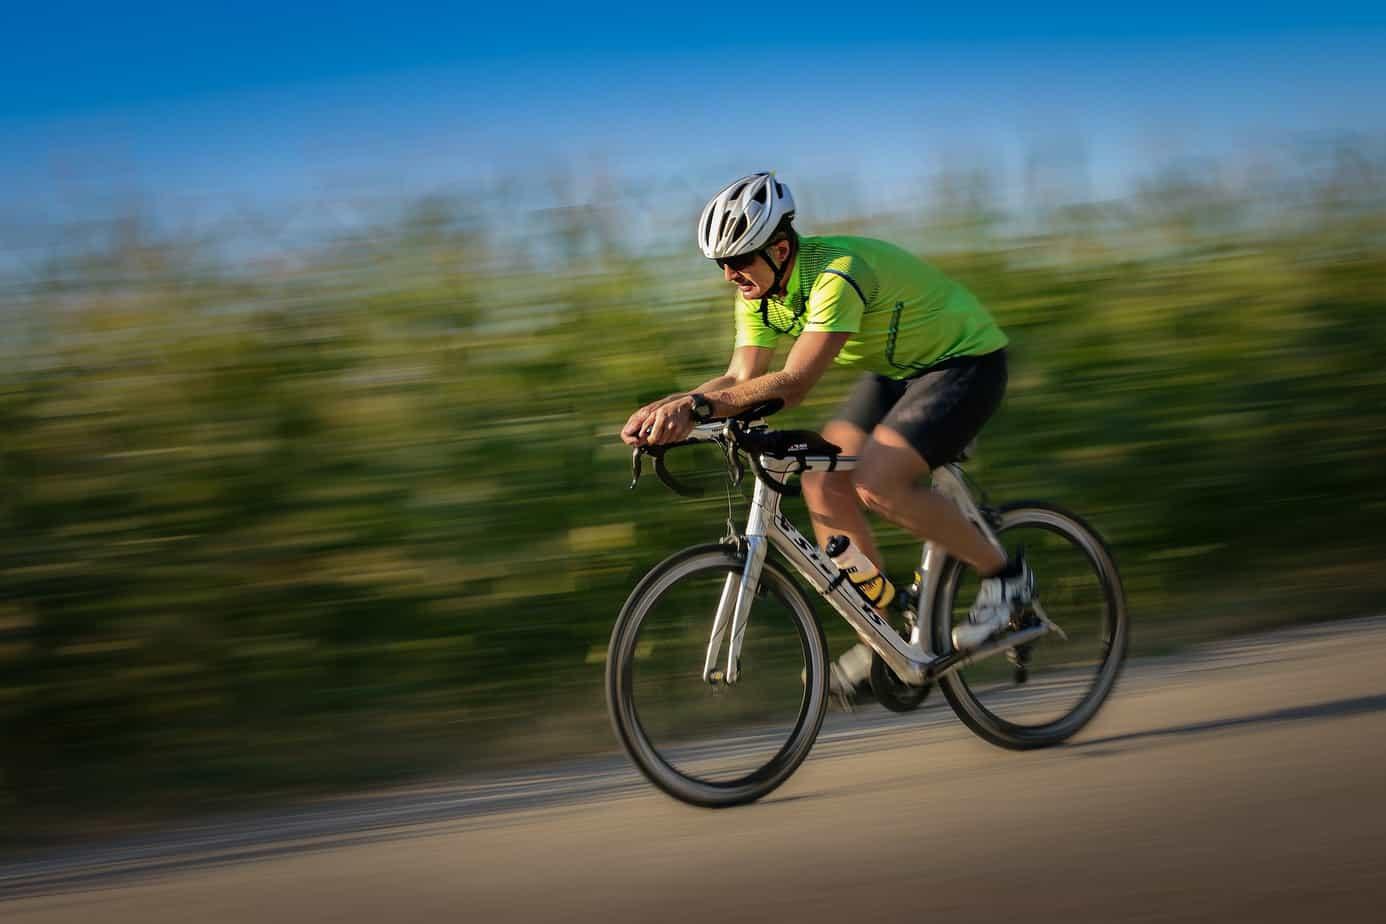 Type of rider